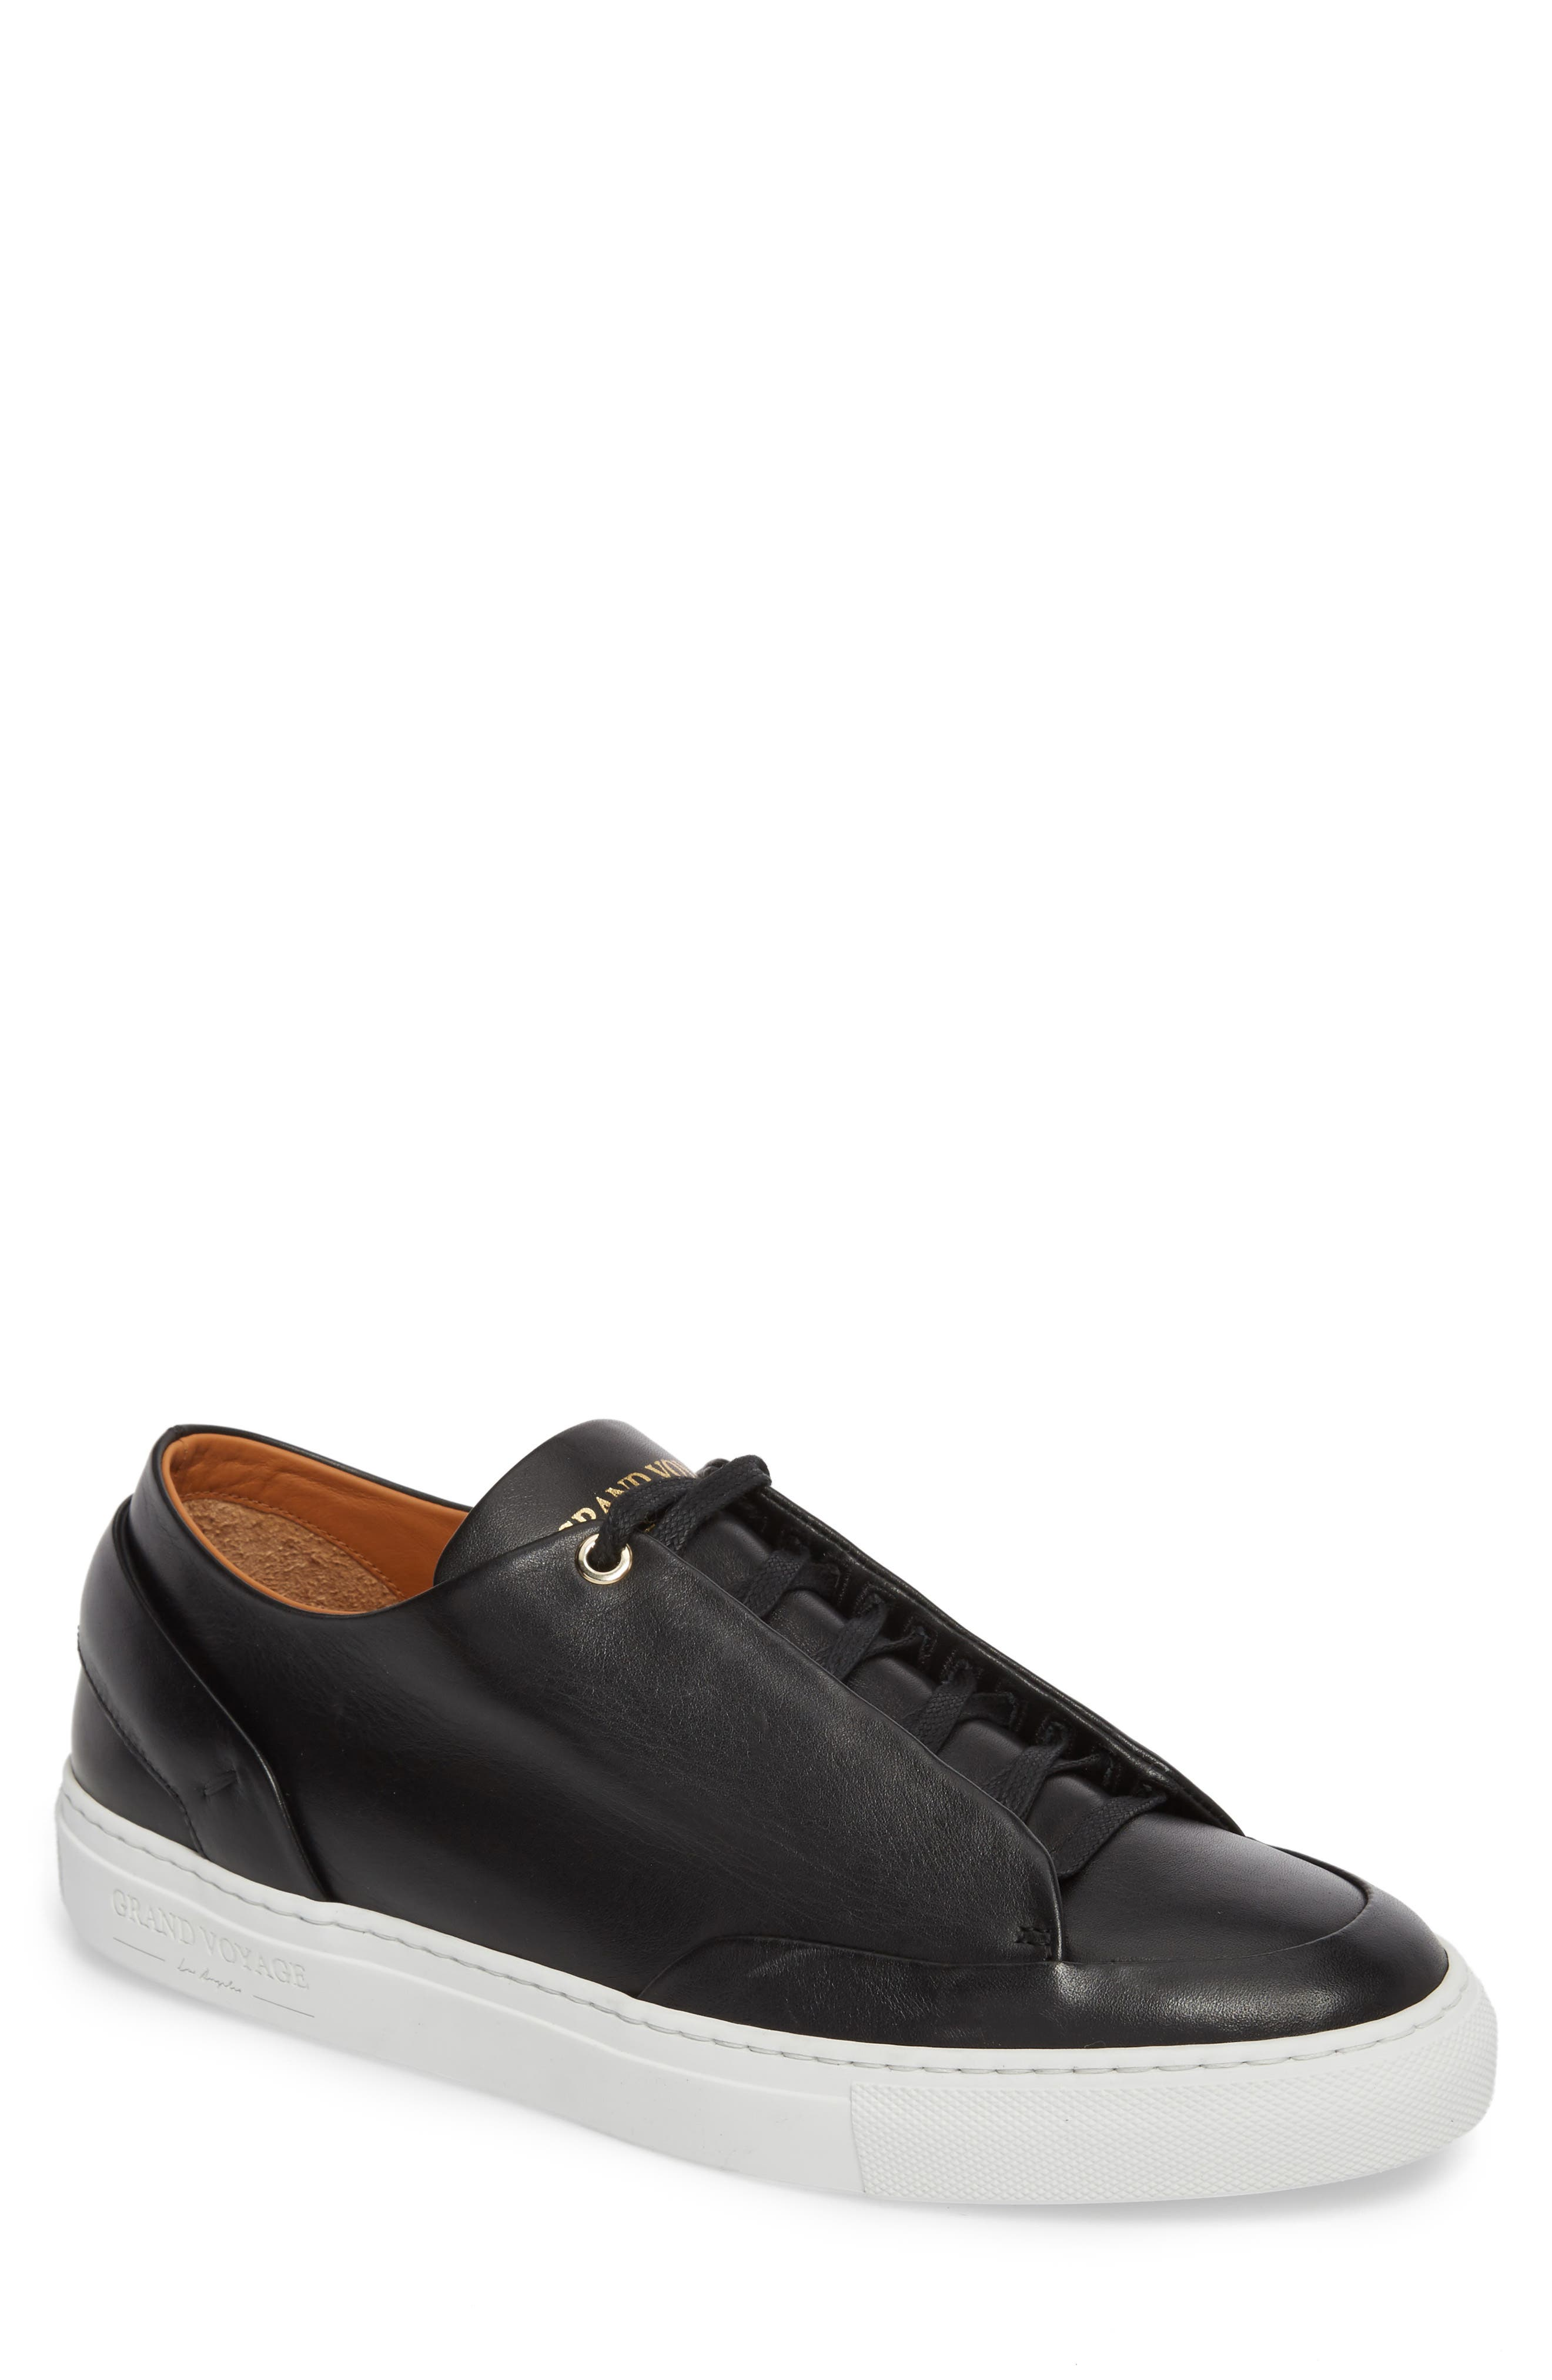 Avedon Sneaker,                         Main,                         color, BLACK LEATHER